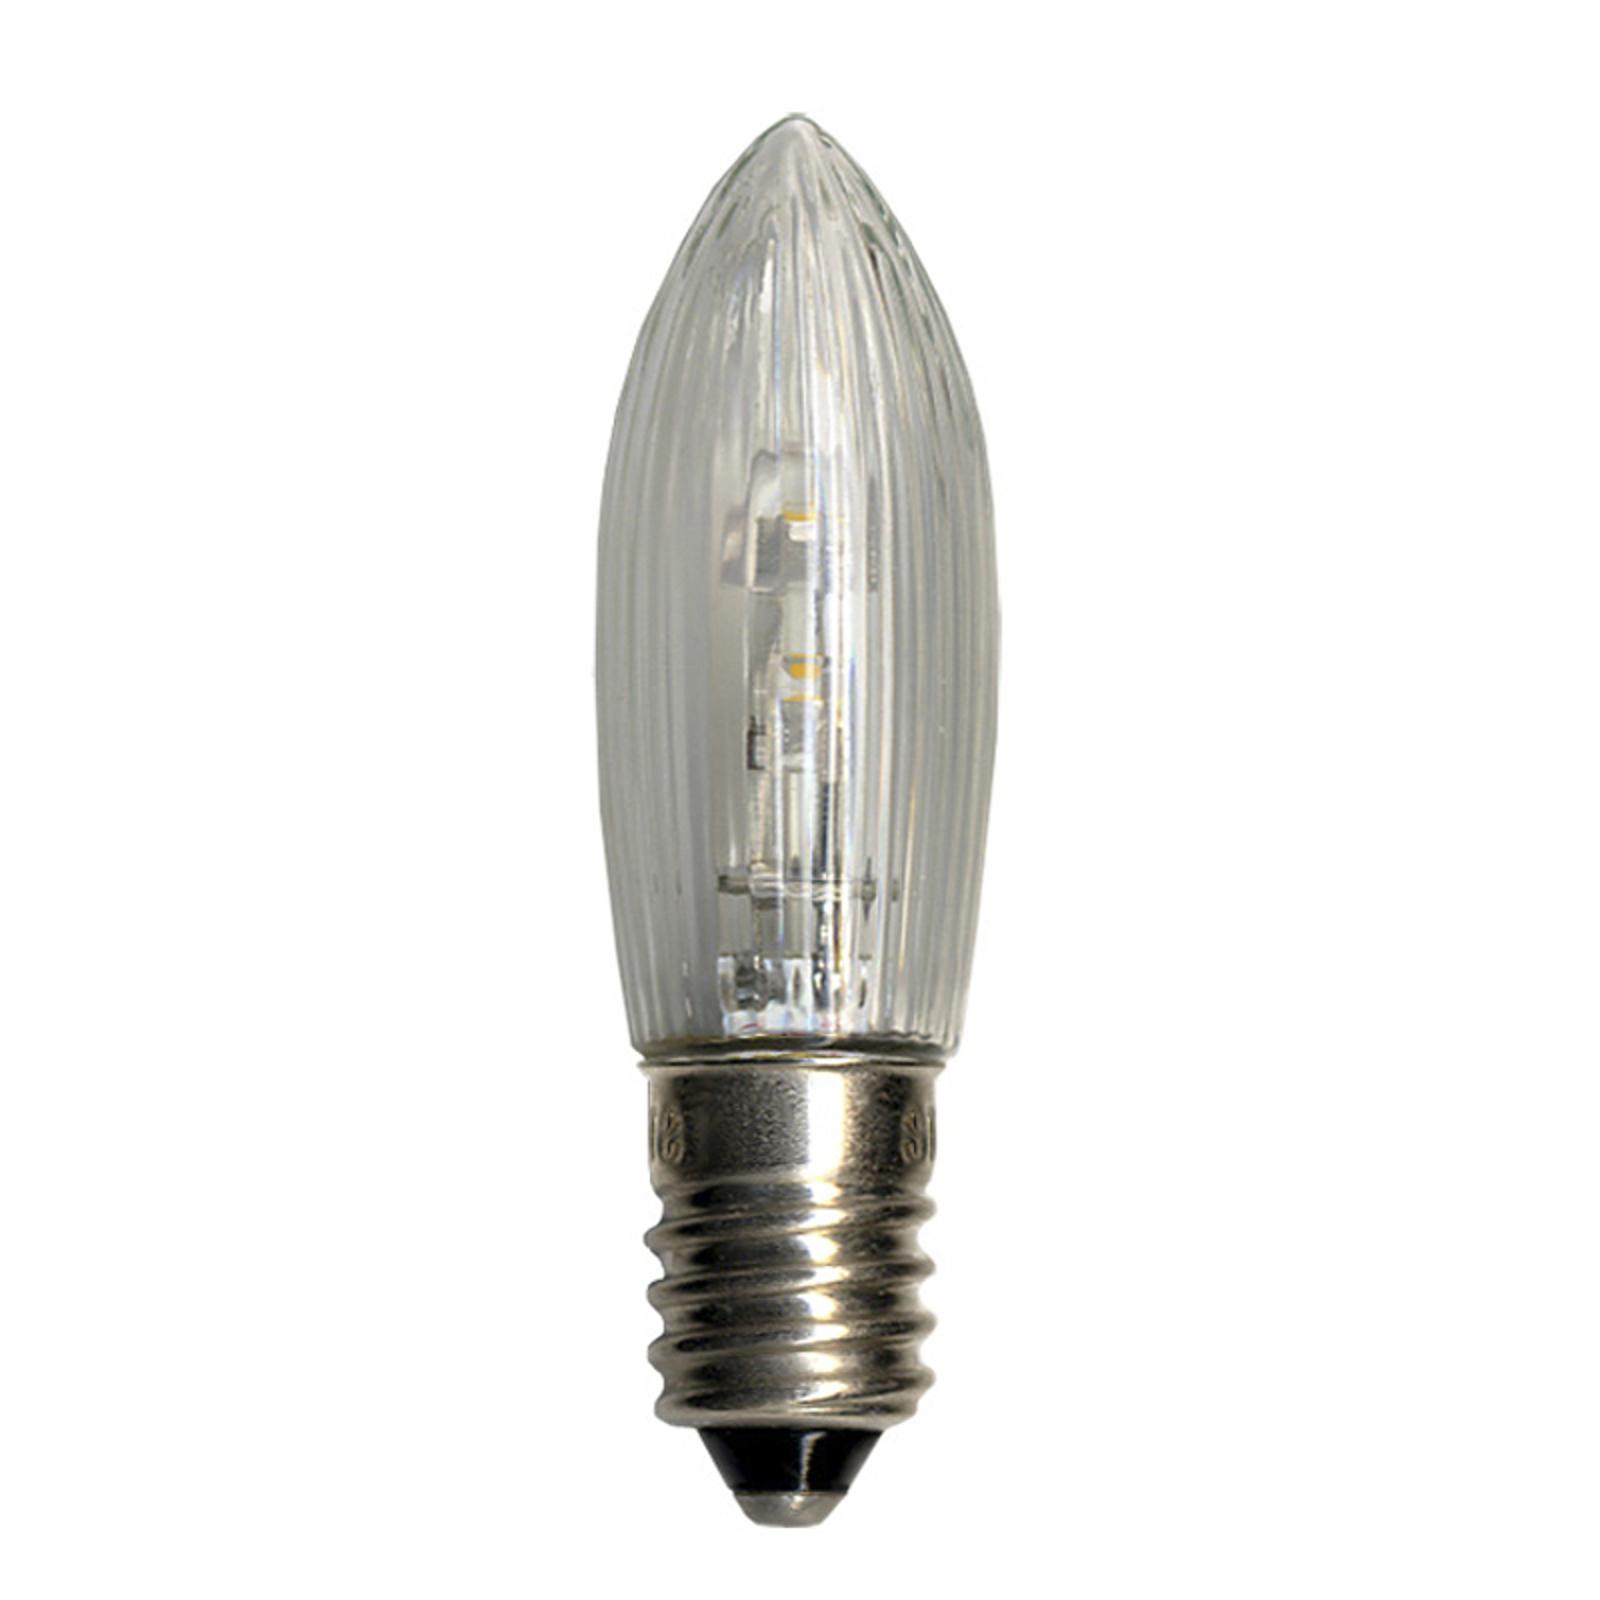 E10 0,2W 10-55V LED 3er stearinljusliknande lampor